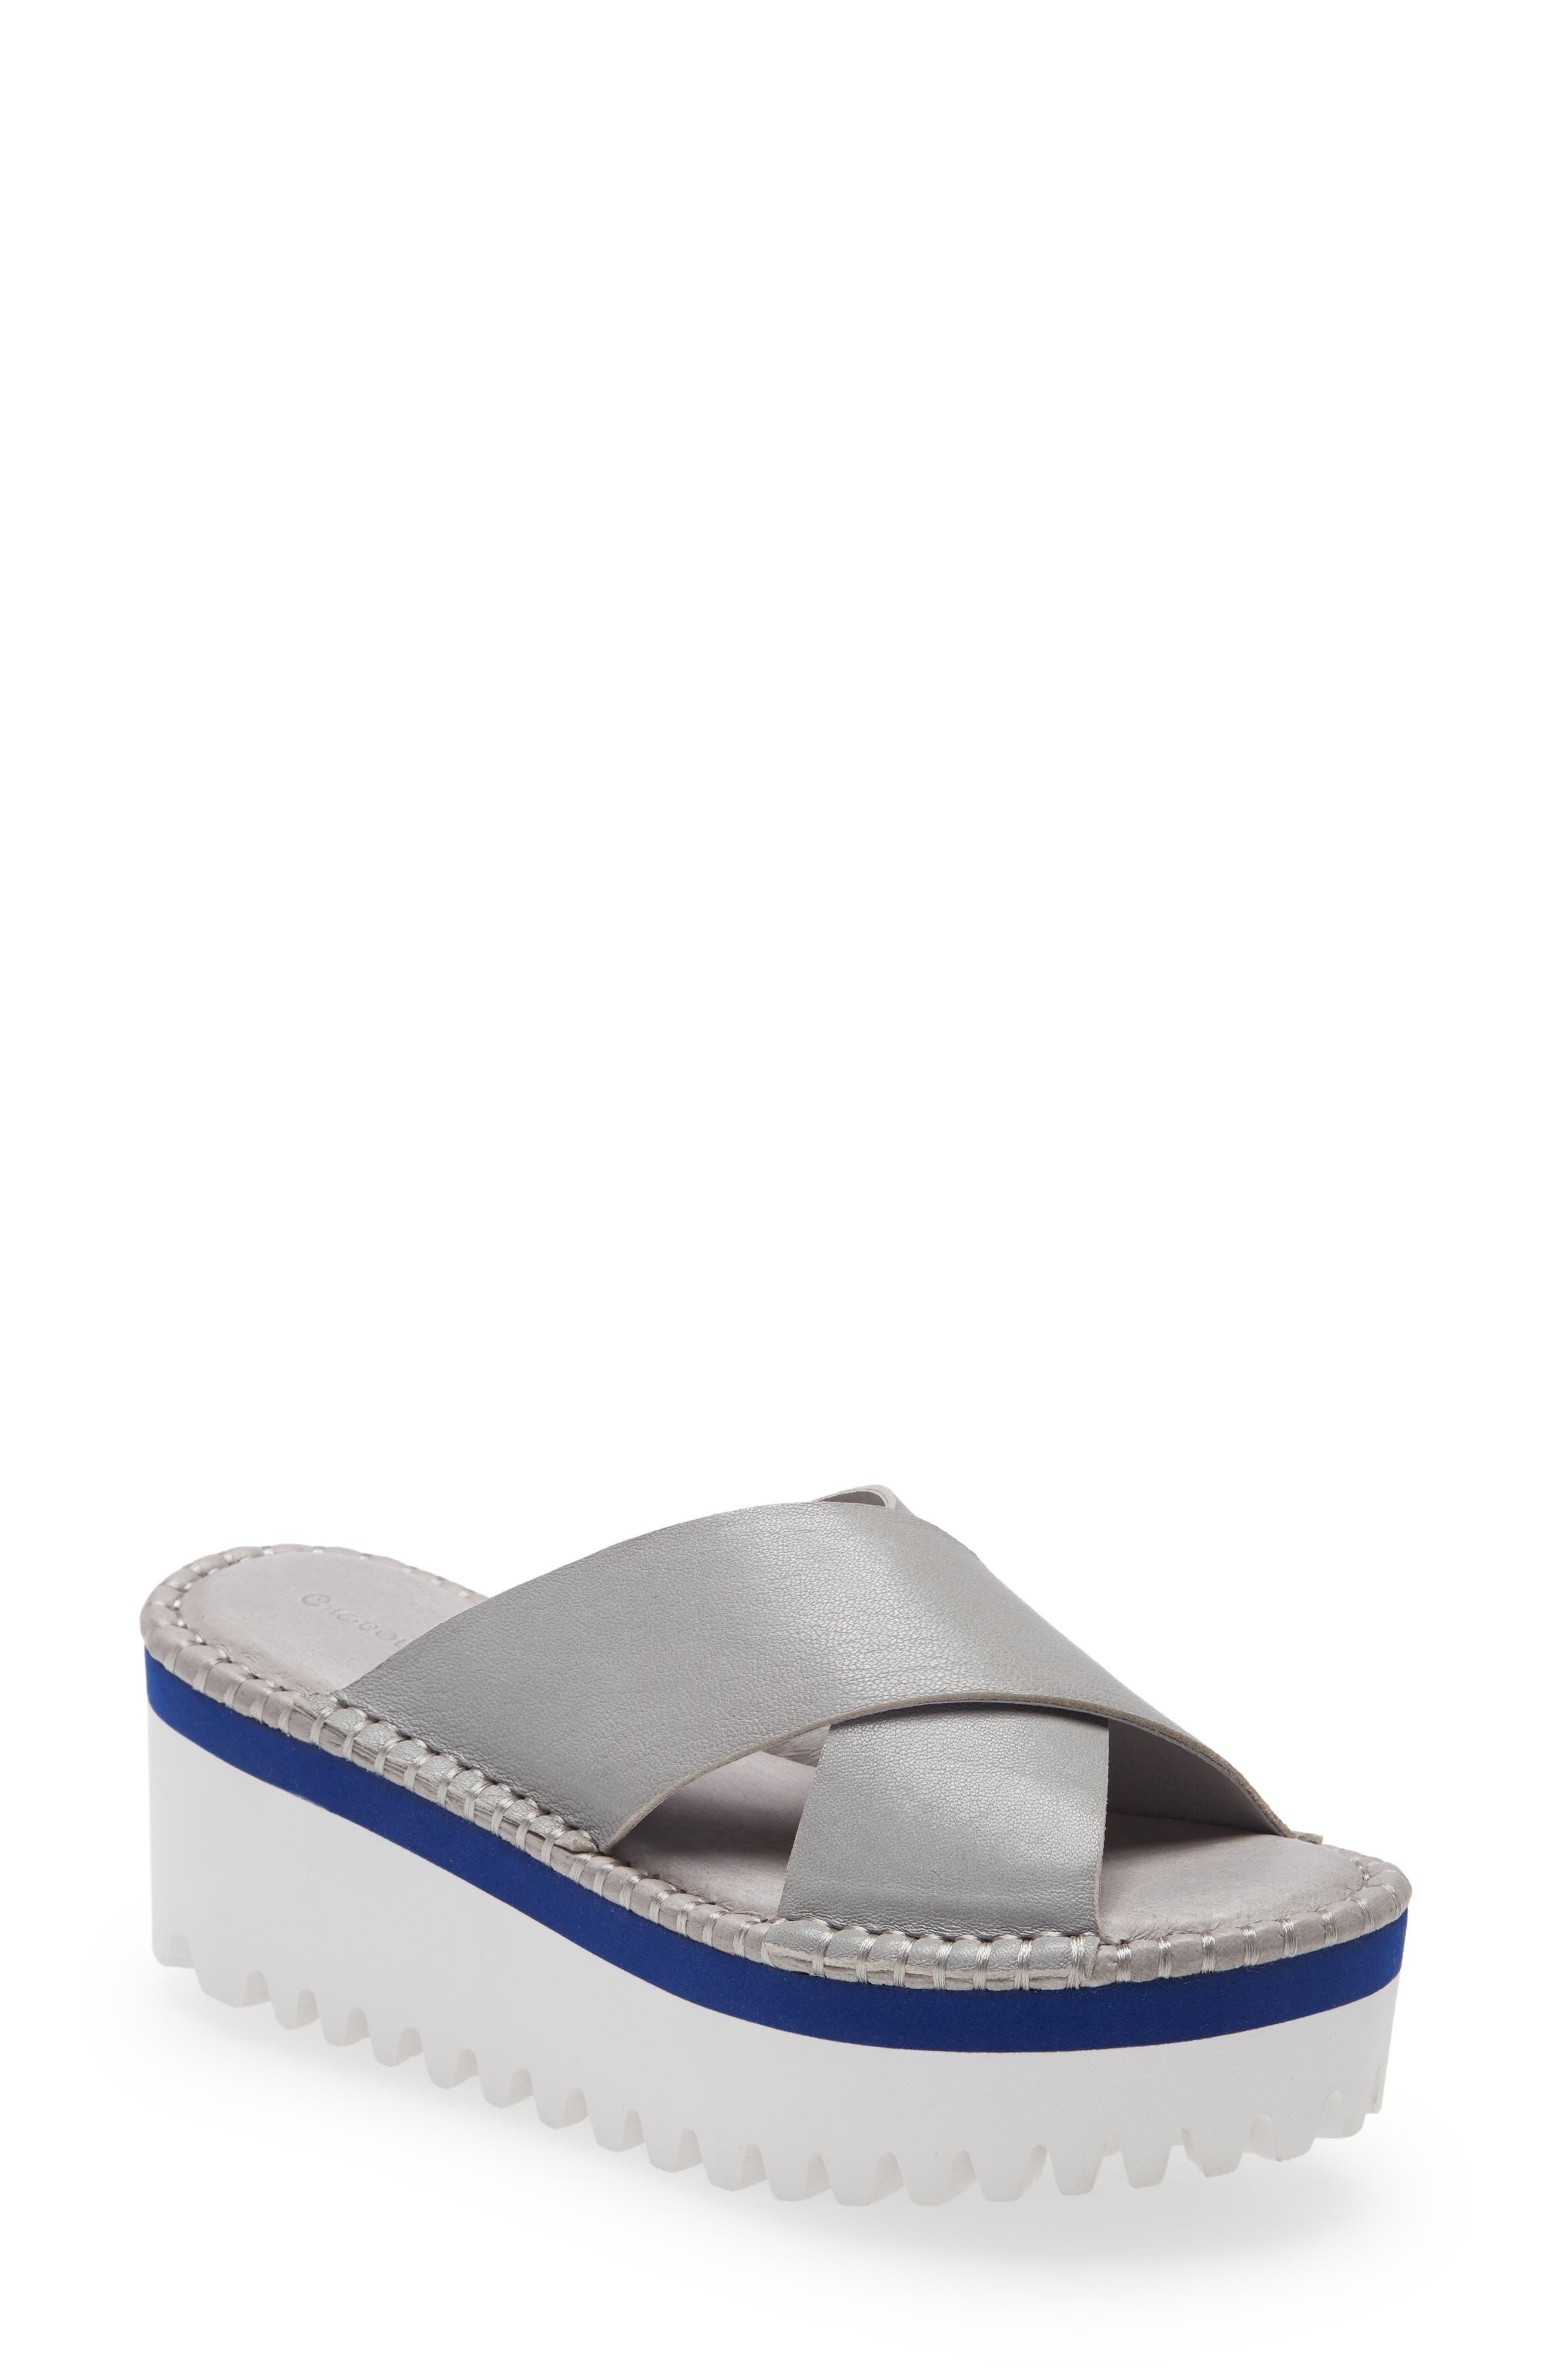 Women's Chocolate Blu Madison Lug Sole Platform Slide Sandal